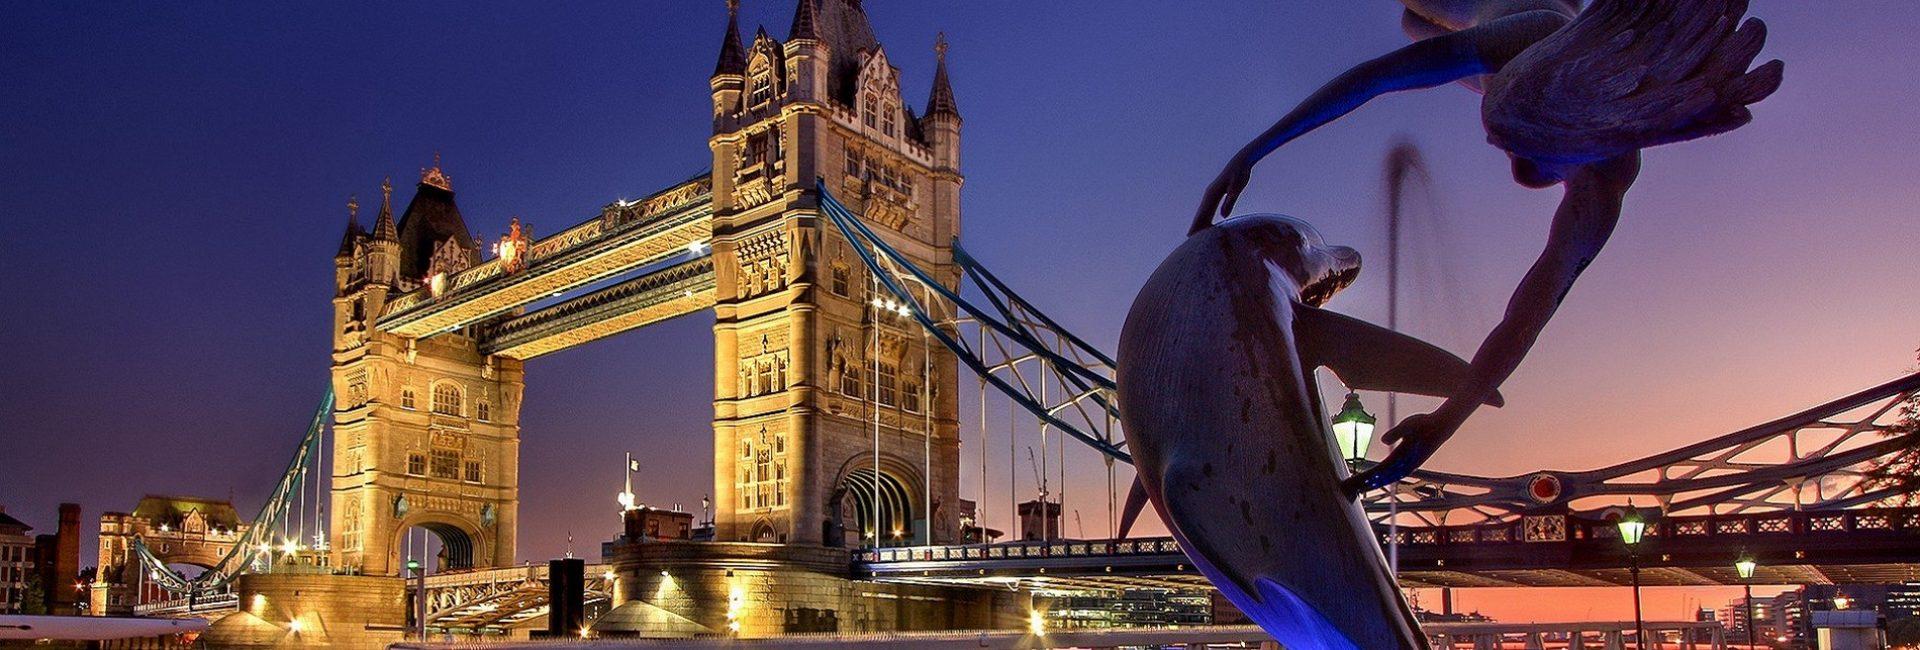 Tečaj engleskog jezika Docklands Campus London